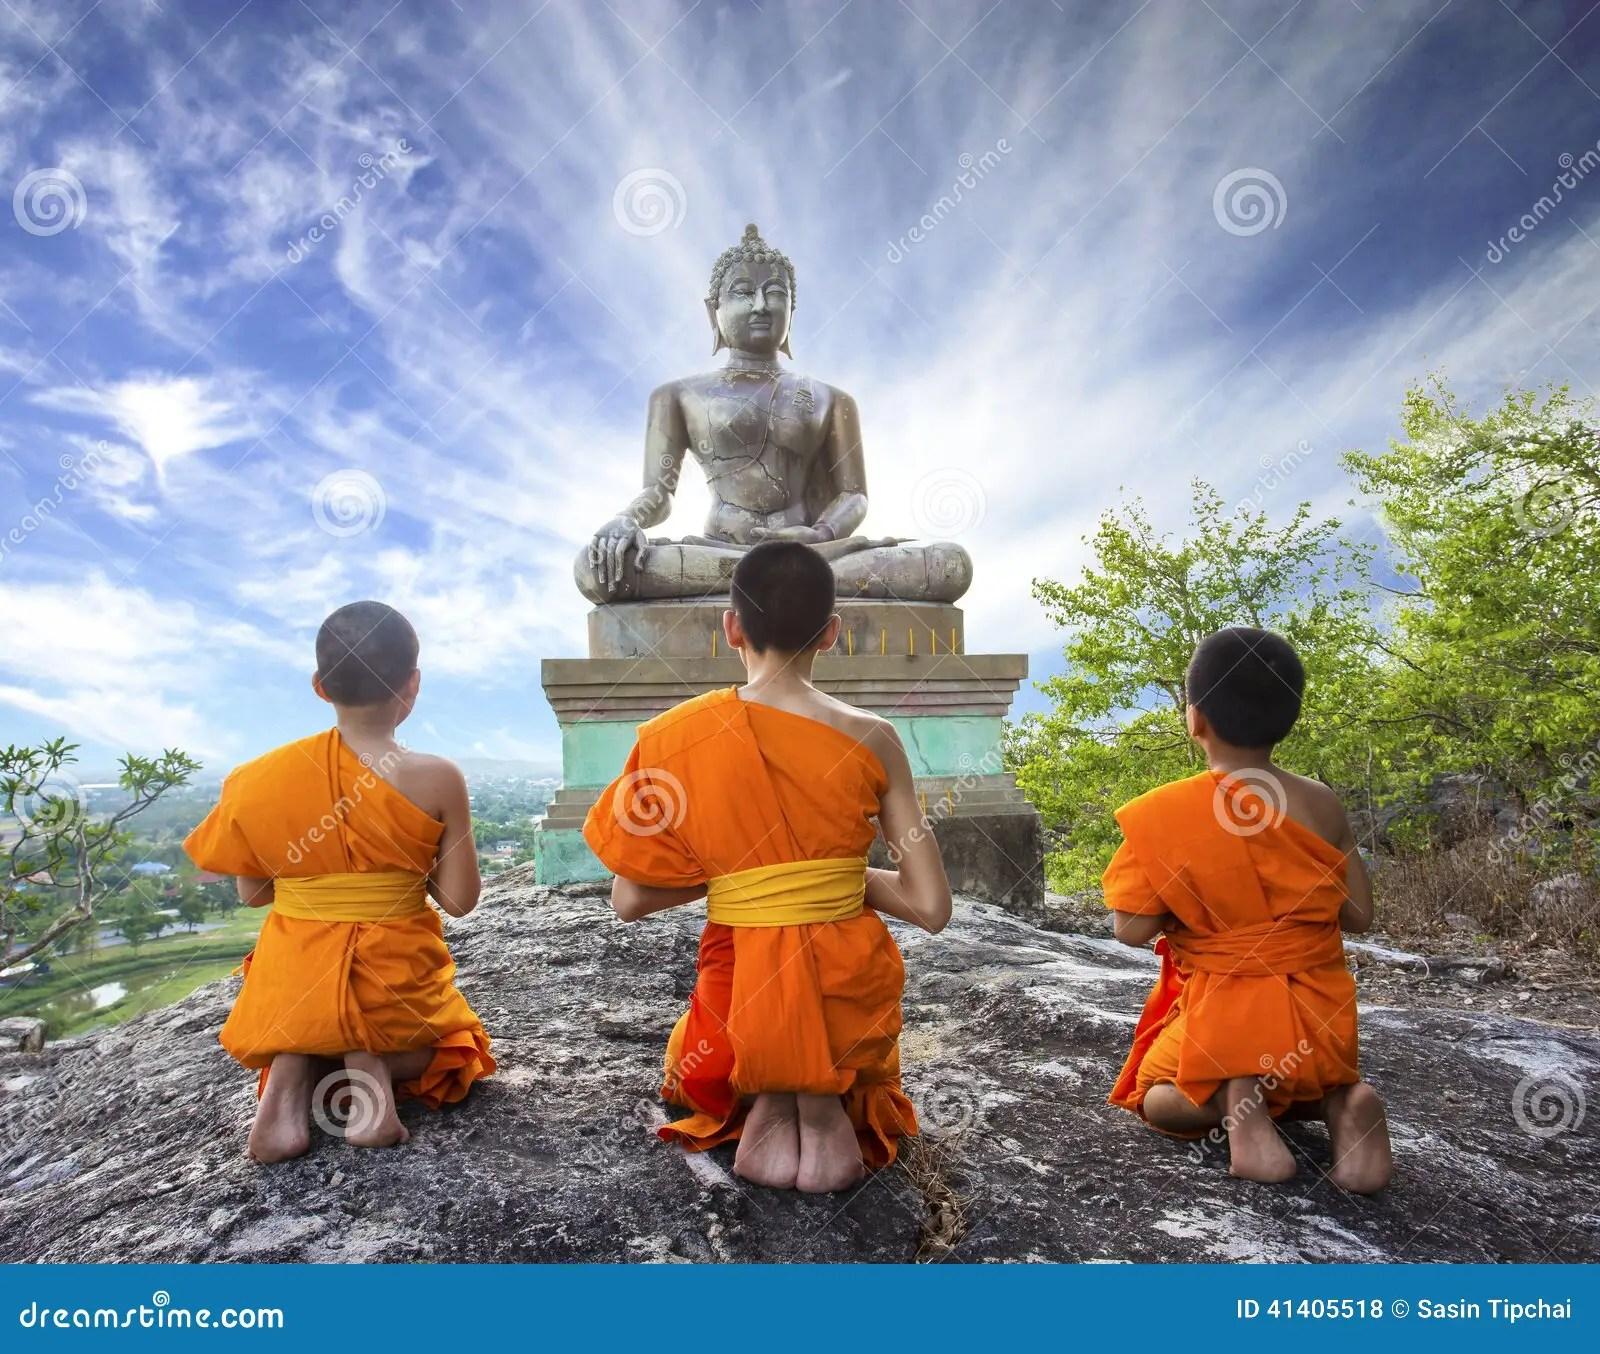 Wesak Wallpaper Hd Novice Monk Praying To The Buddha In Phrabuddhachay Temple